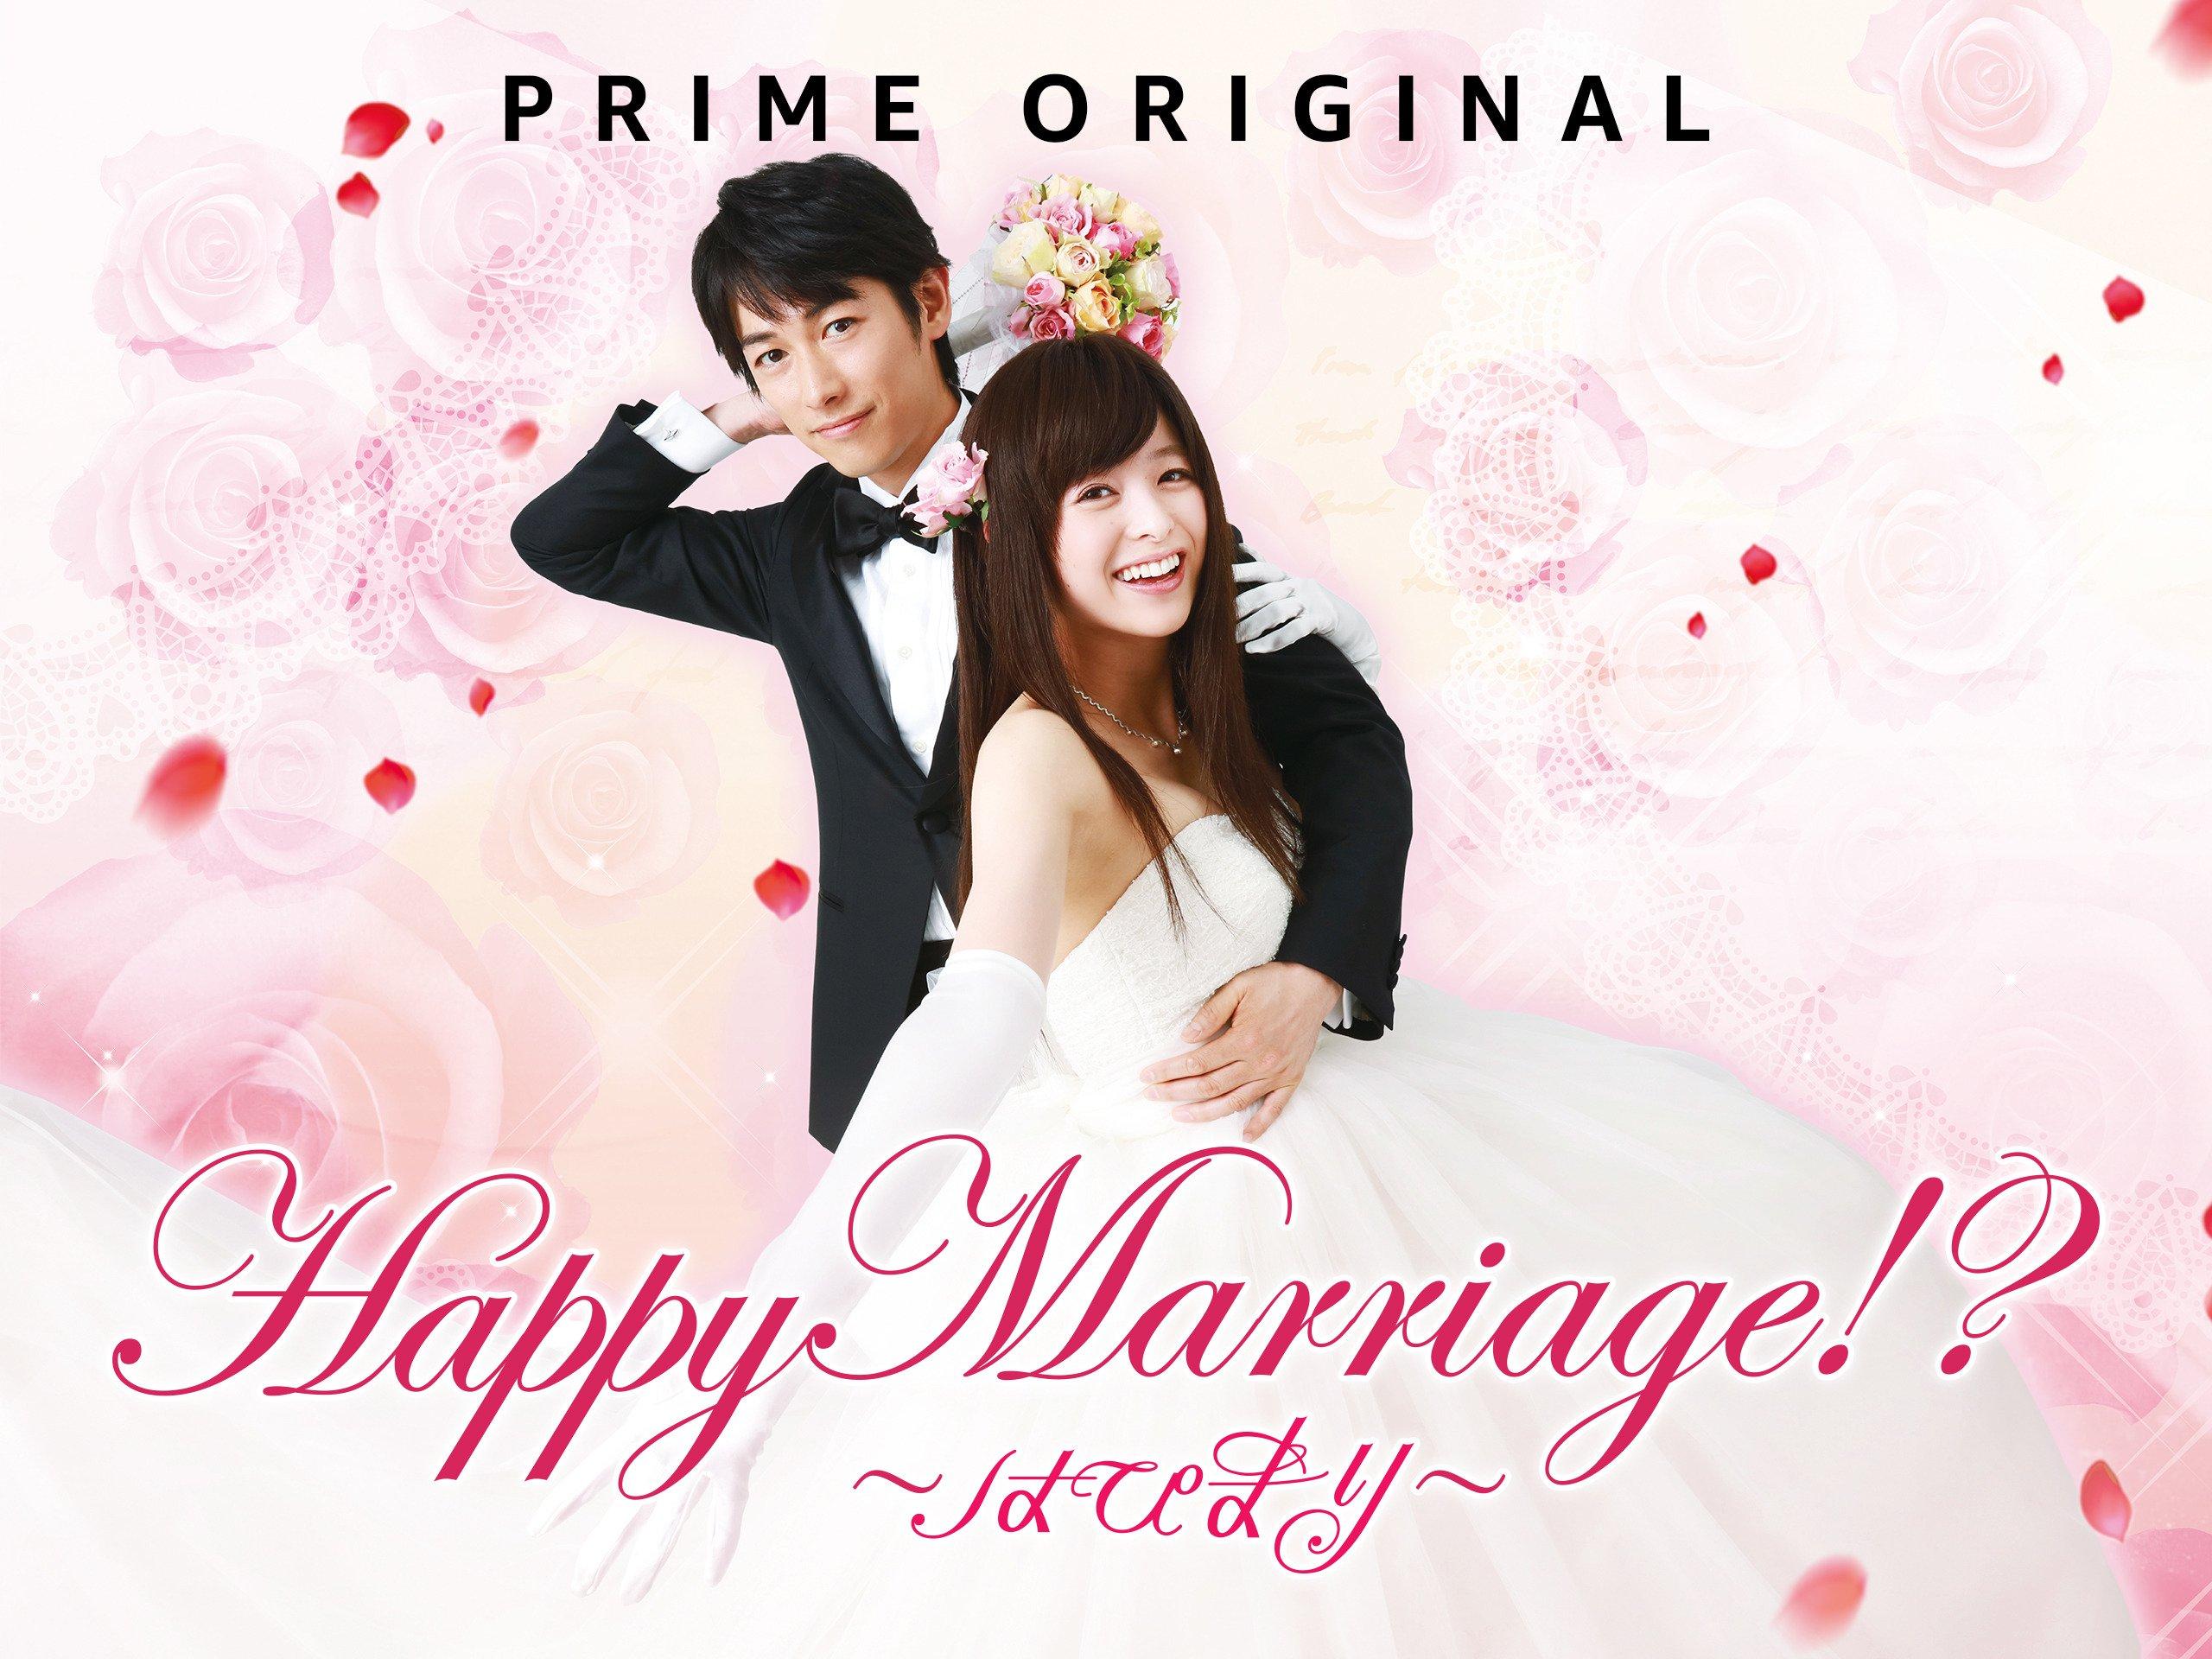 Happy Marriage!? Season 1 - Season 1